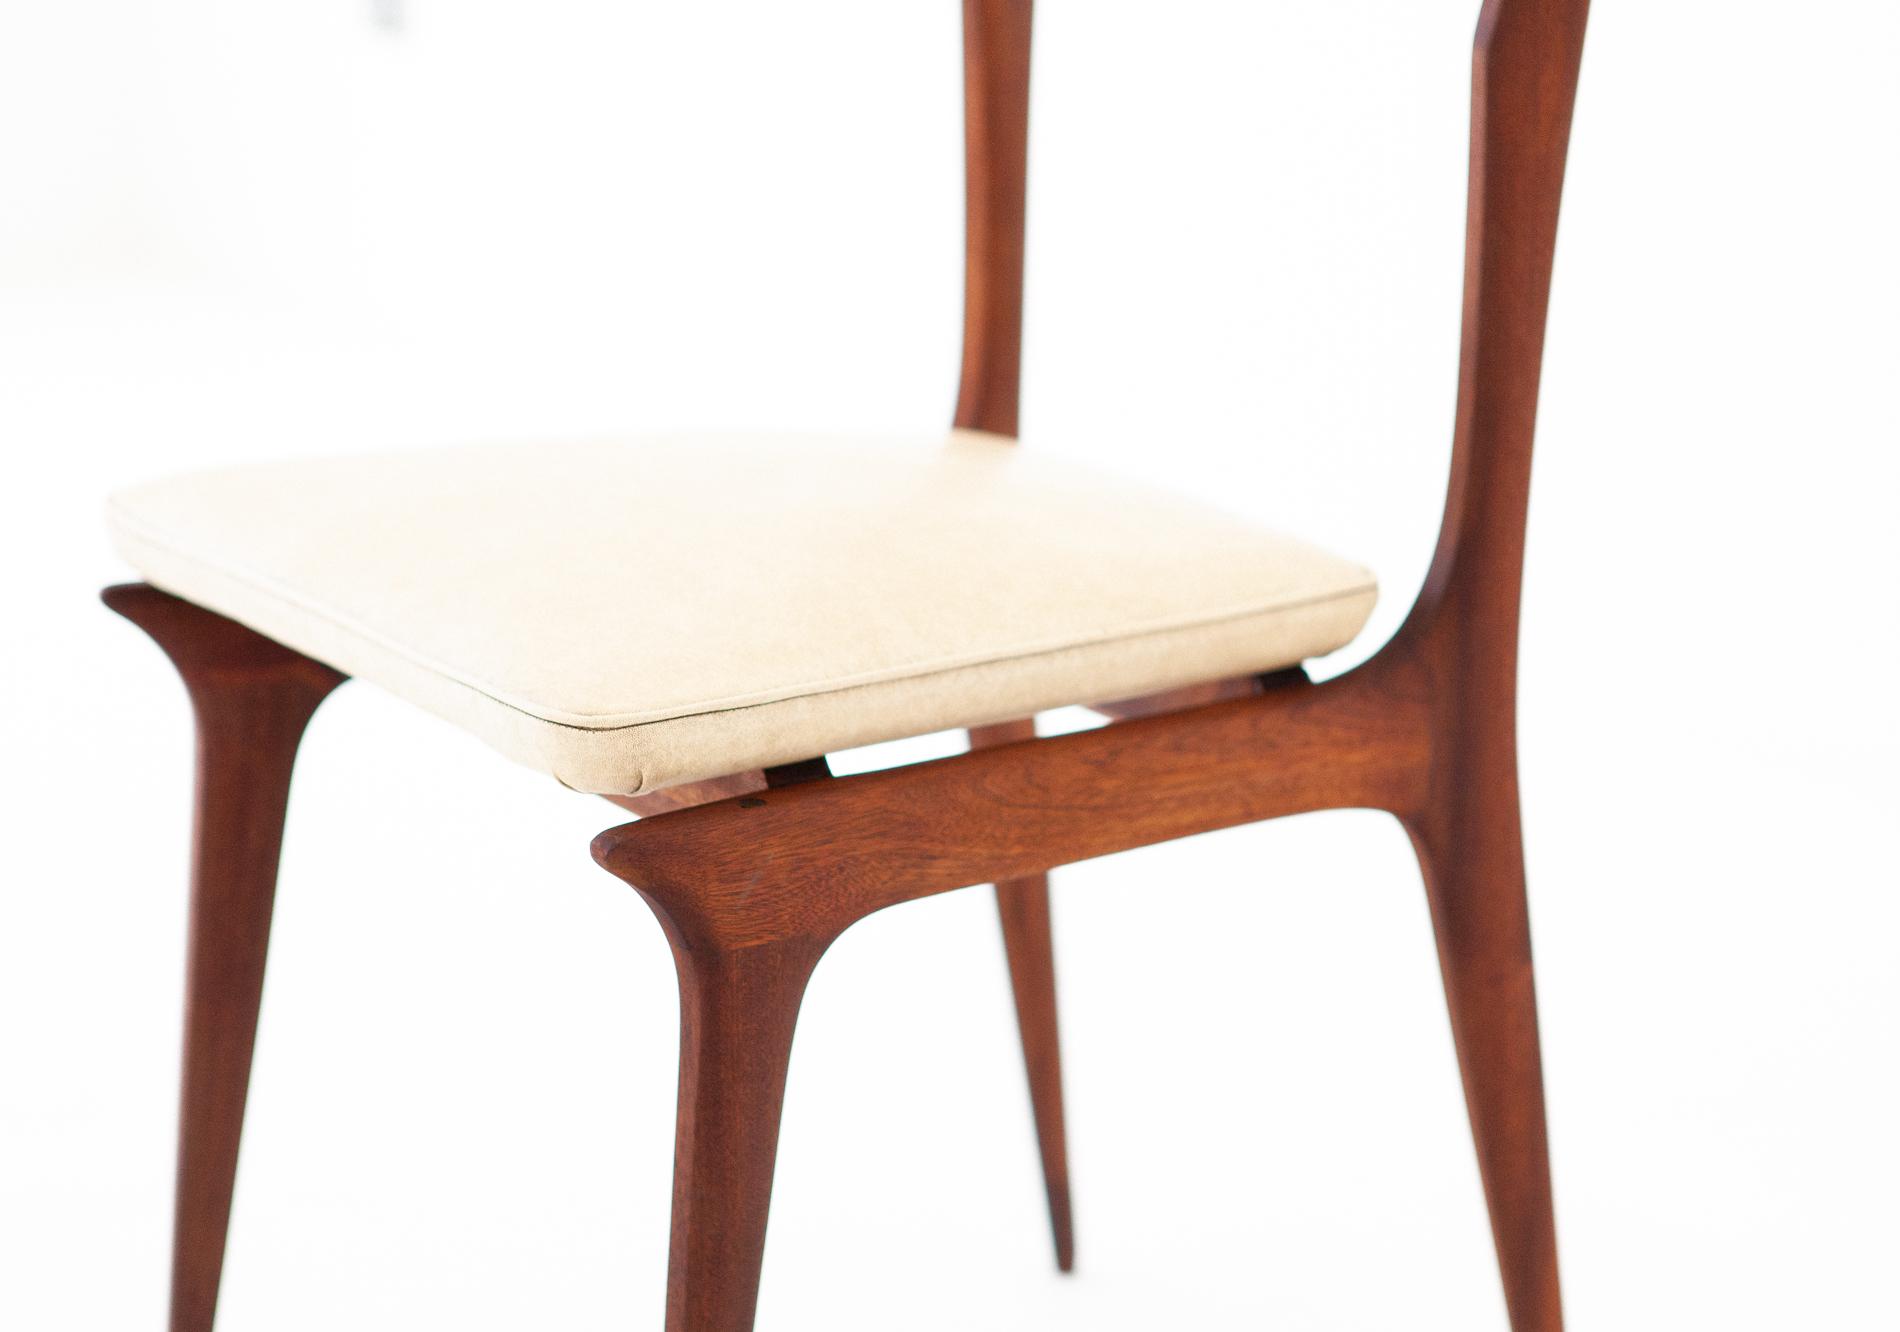 six-italian-mahogany-beige-skai-dining-chairs-2-SE281